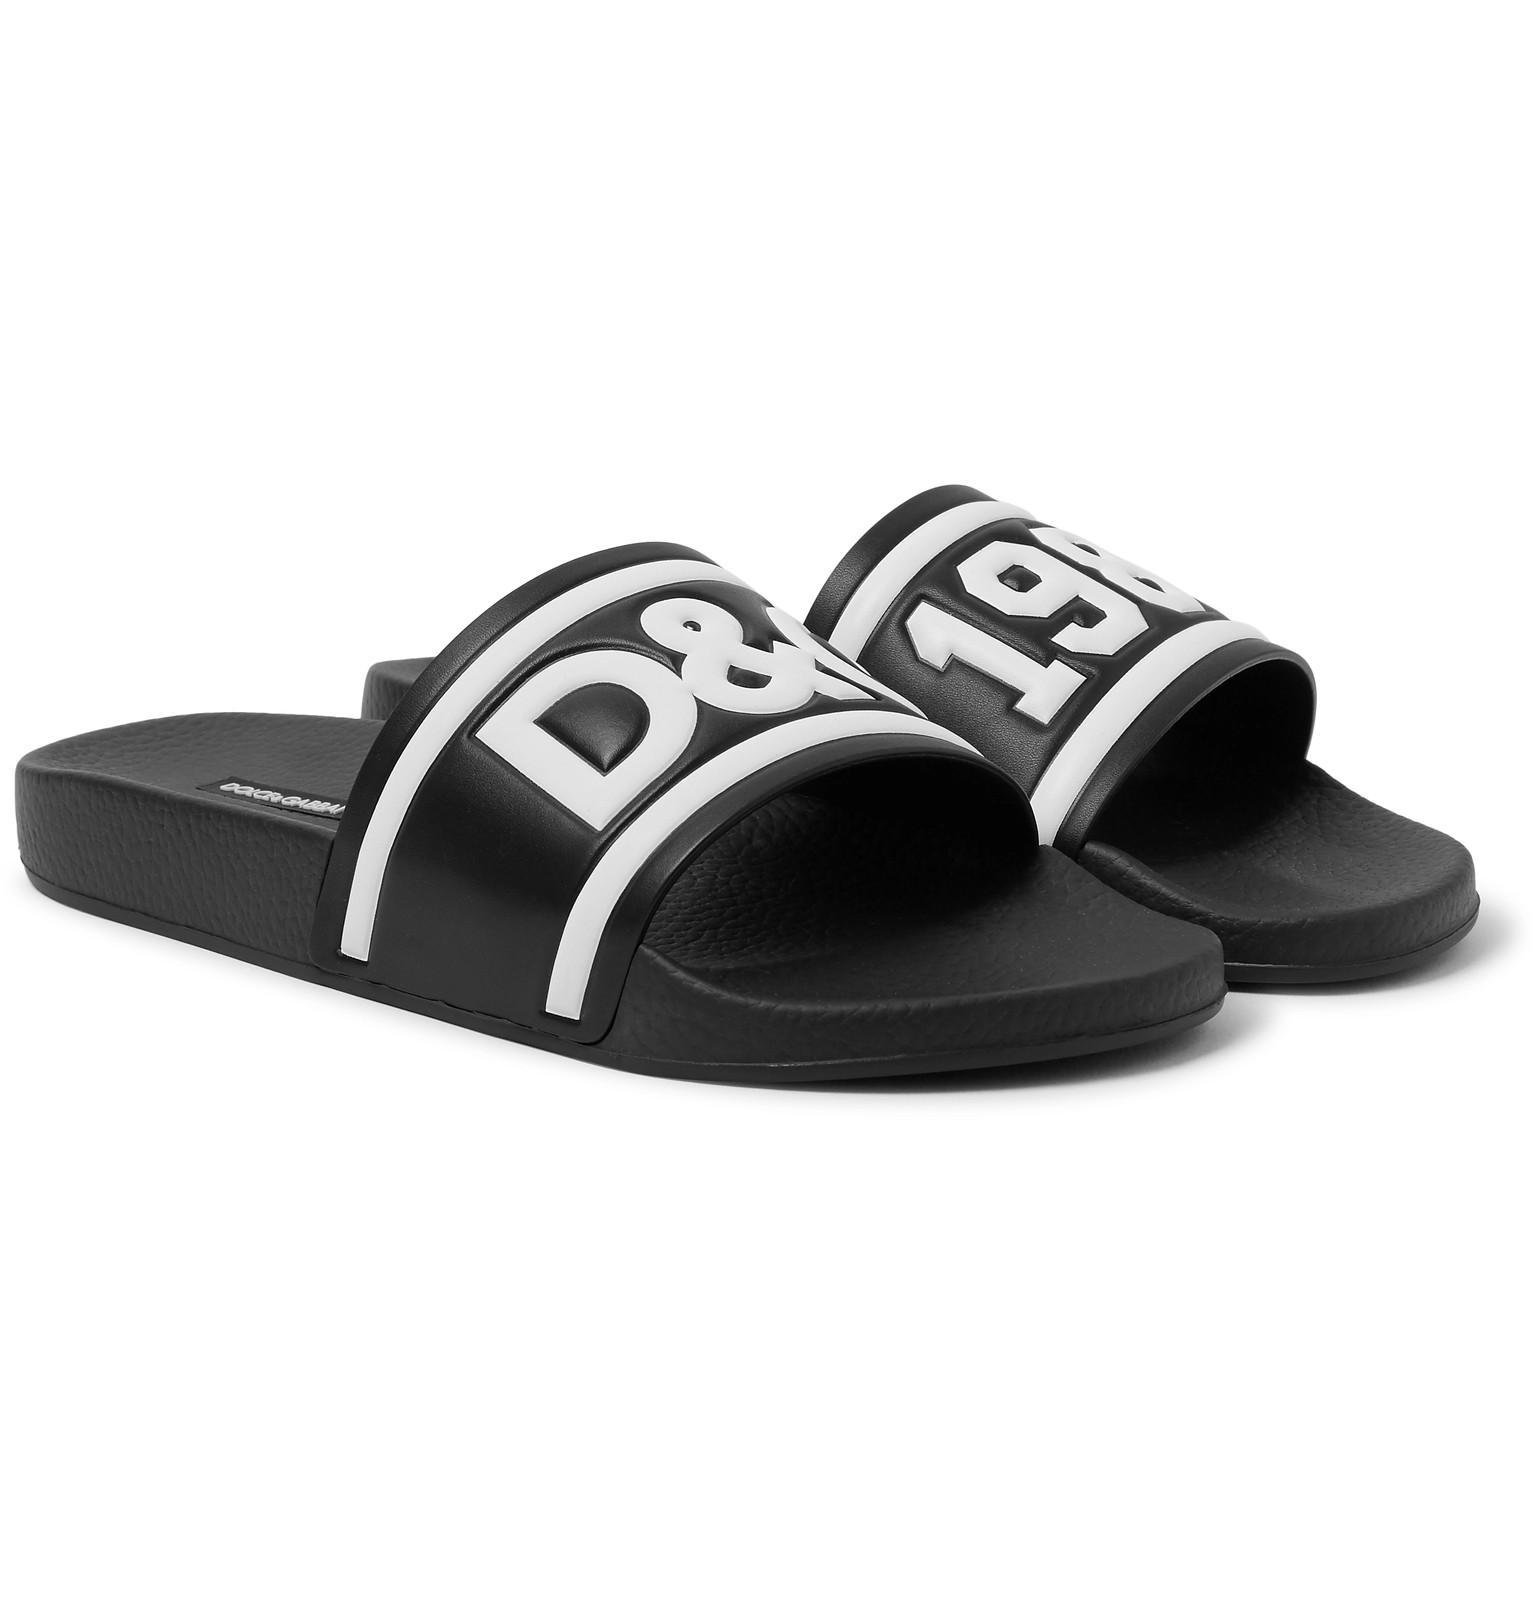 Dolce & Gabbana Rubber Slides mYOH7na1t